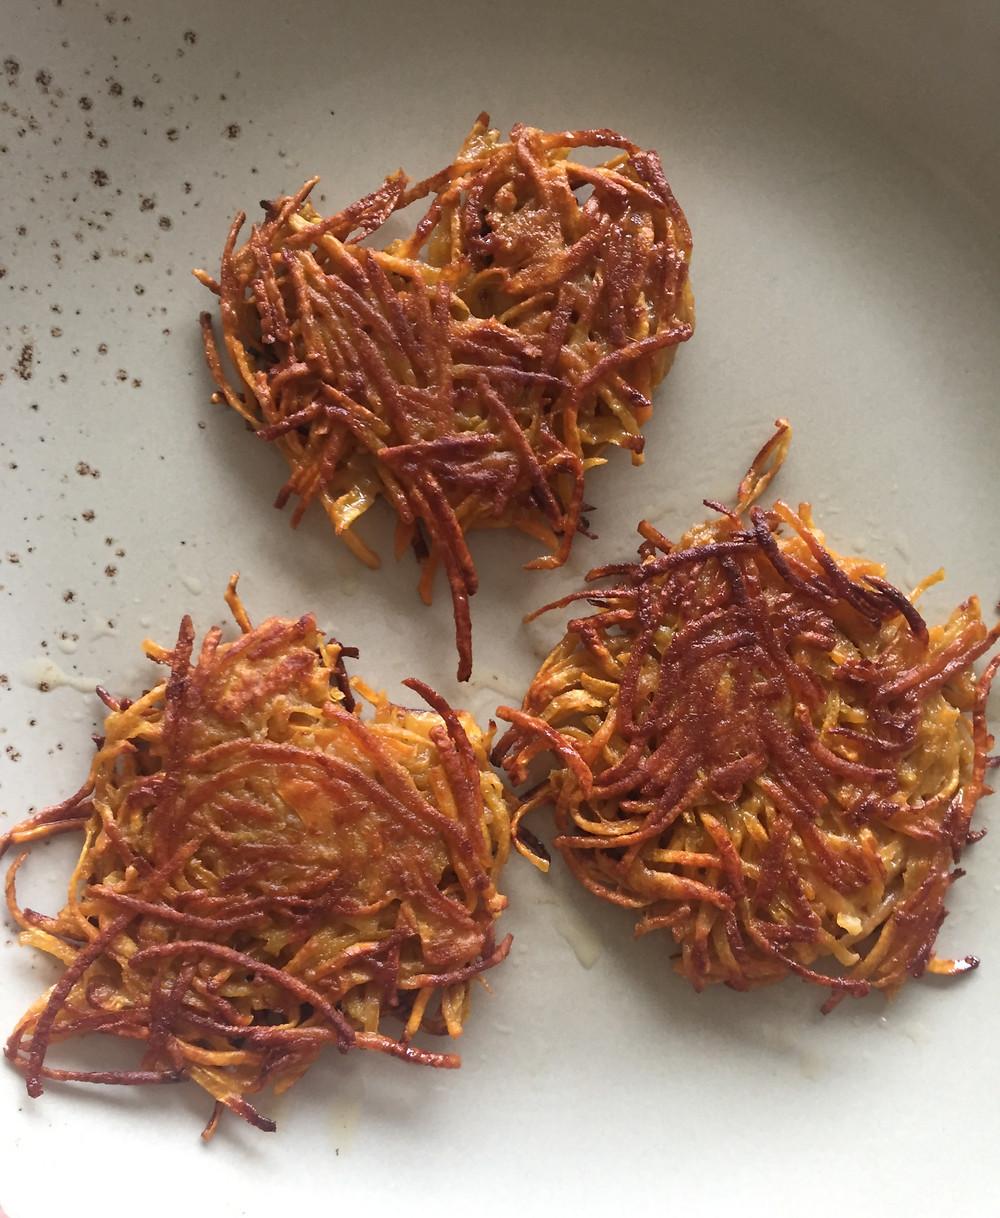 Süßkartoffelrösti Süßkartoffelpuffer Bio-Süßkartoffeln Sönkes Süßkartoffeln Süsskartoffel